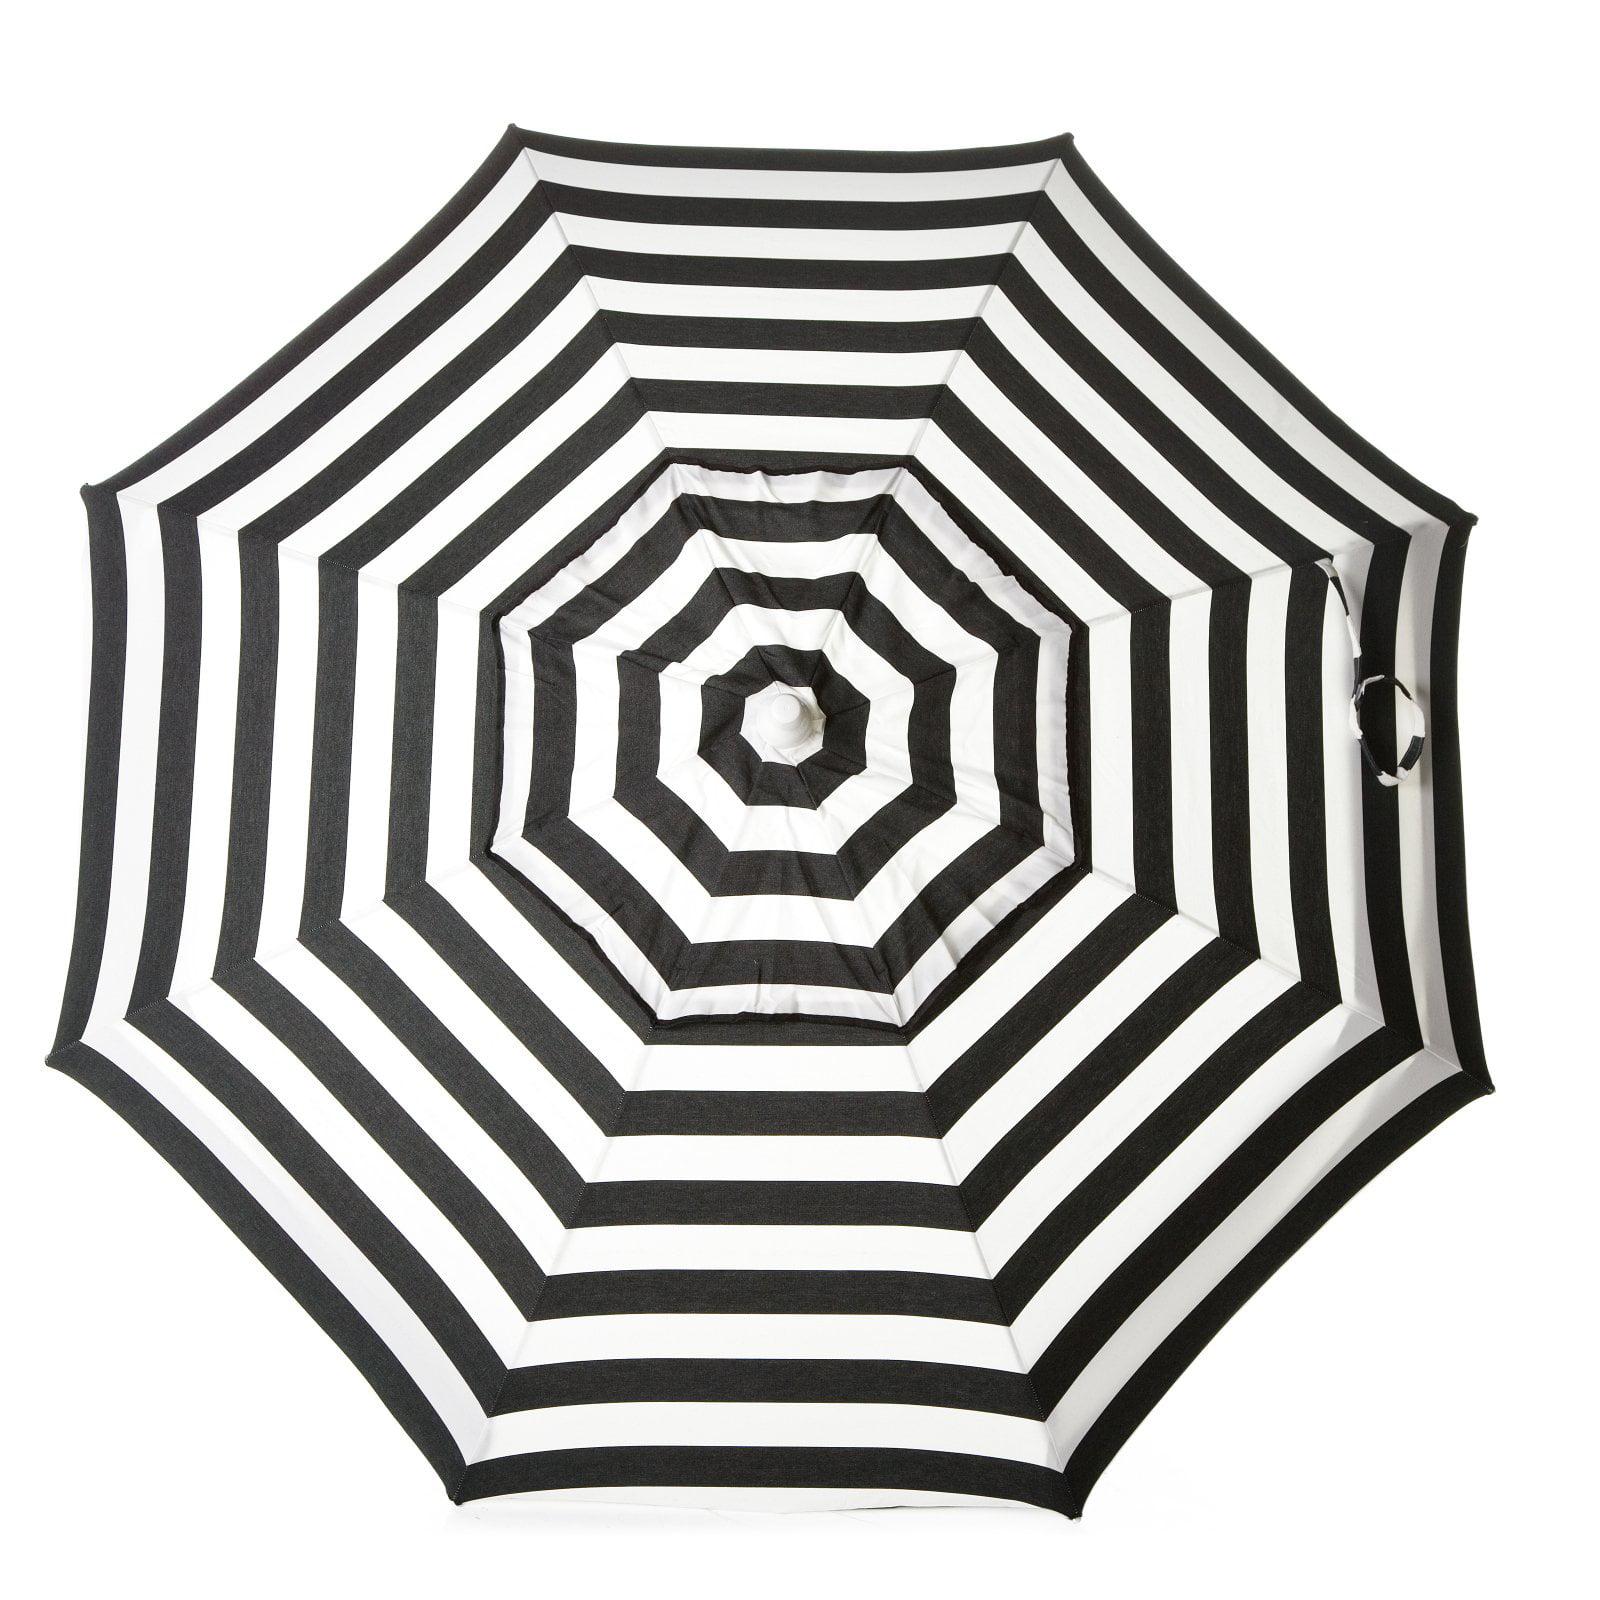 DestinationGear Italian 6' Umbrella Acrylic Stripes Black and White Beach Pole by Kipsun Destination Lifestyle